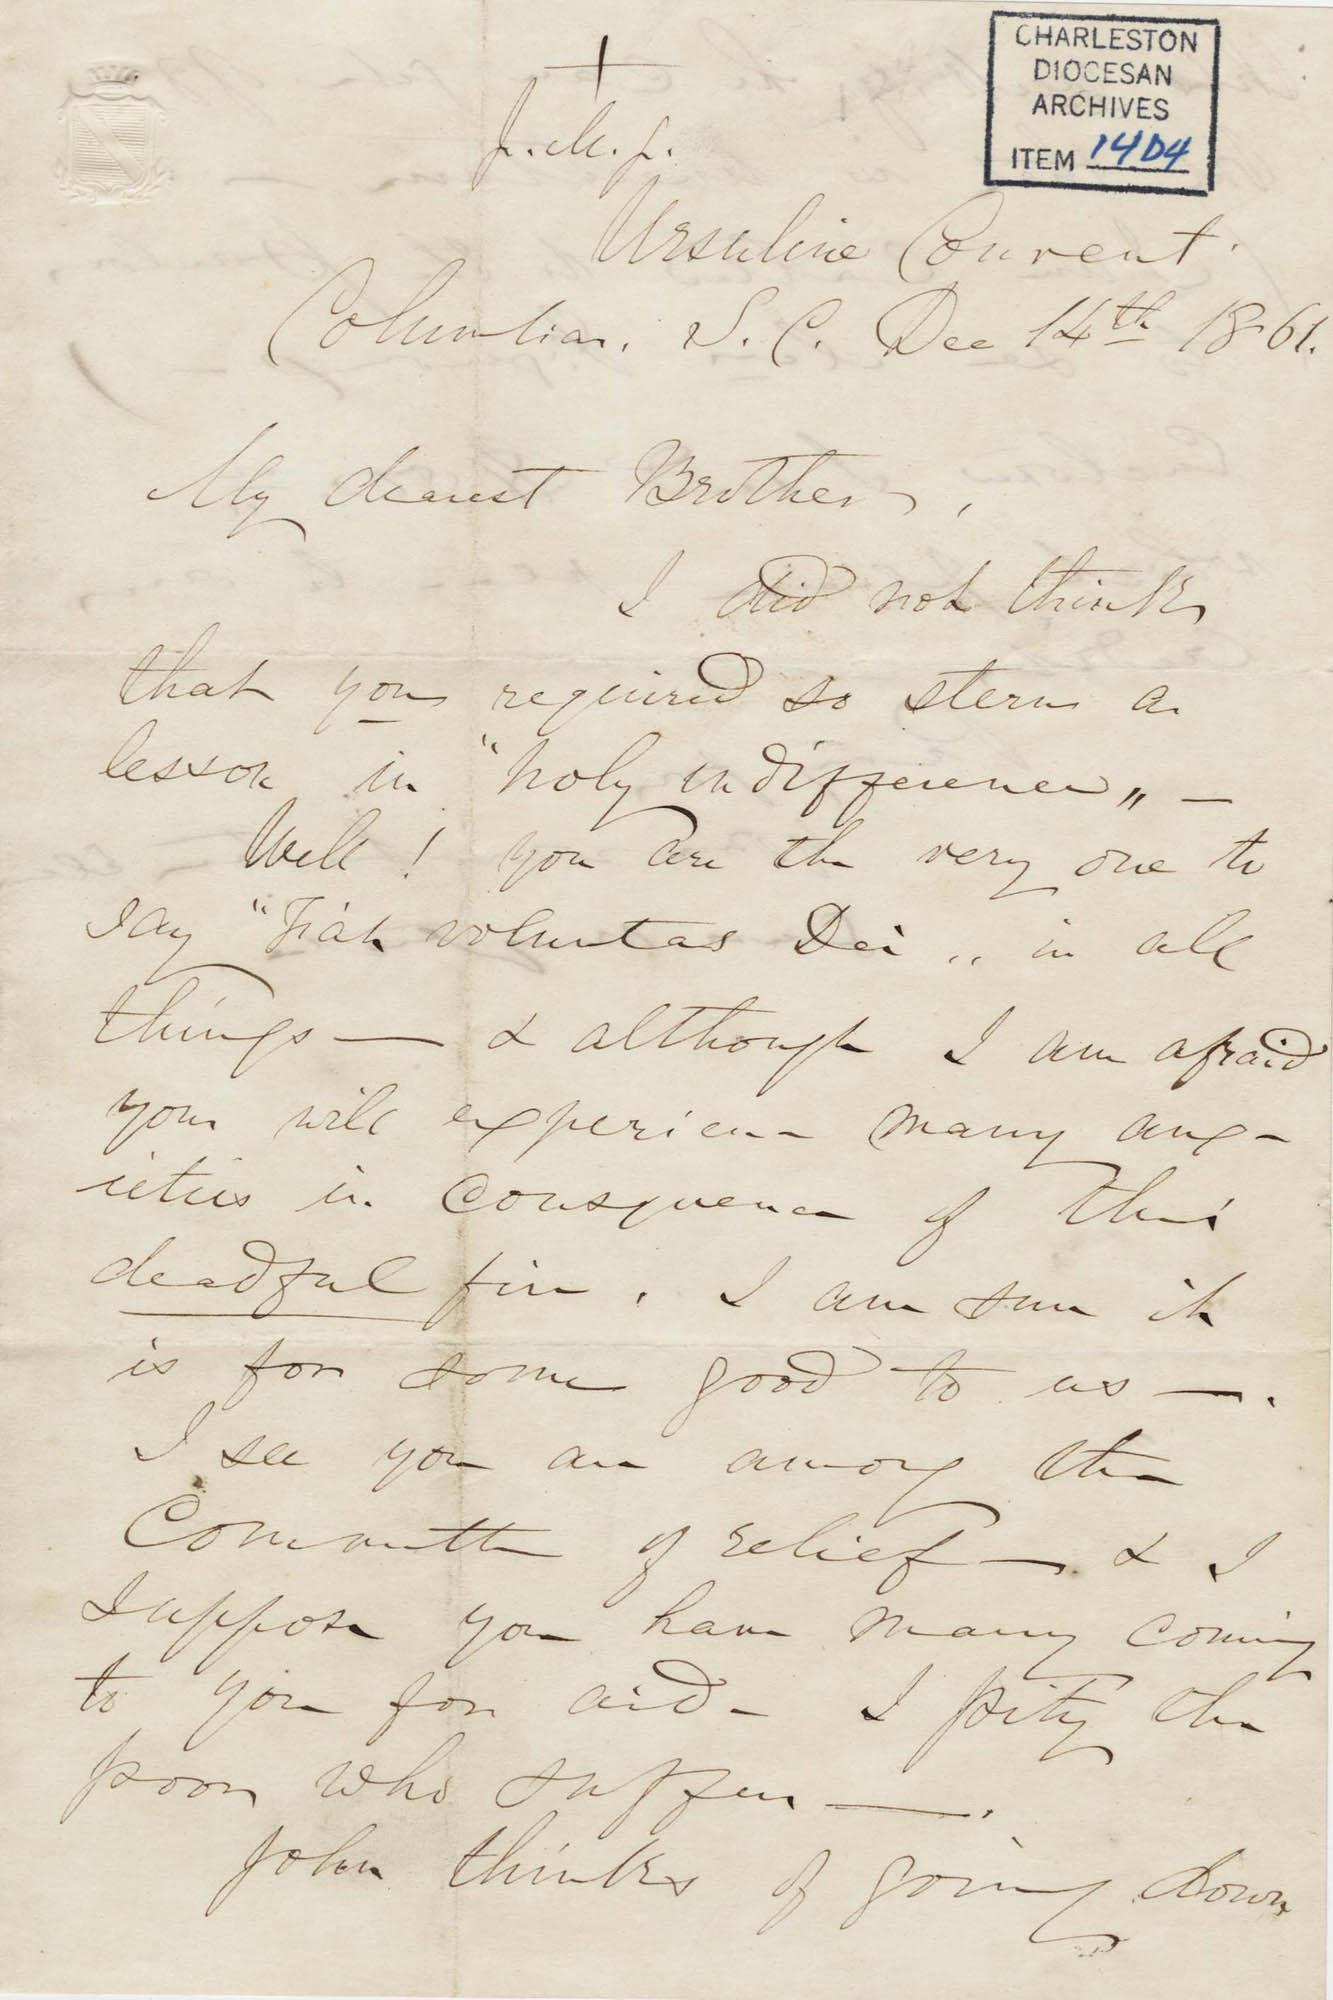 188. Madame Baptiste to Bp Patrick Lynch -- December 14, 1861